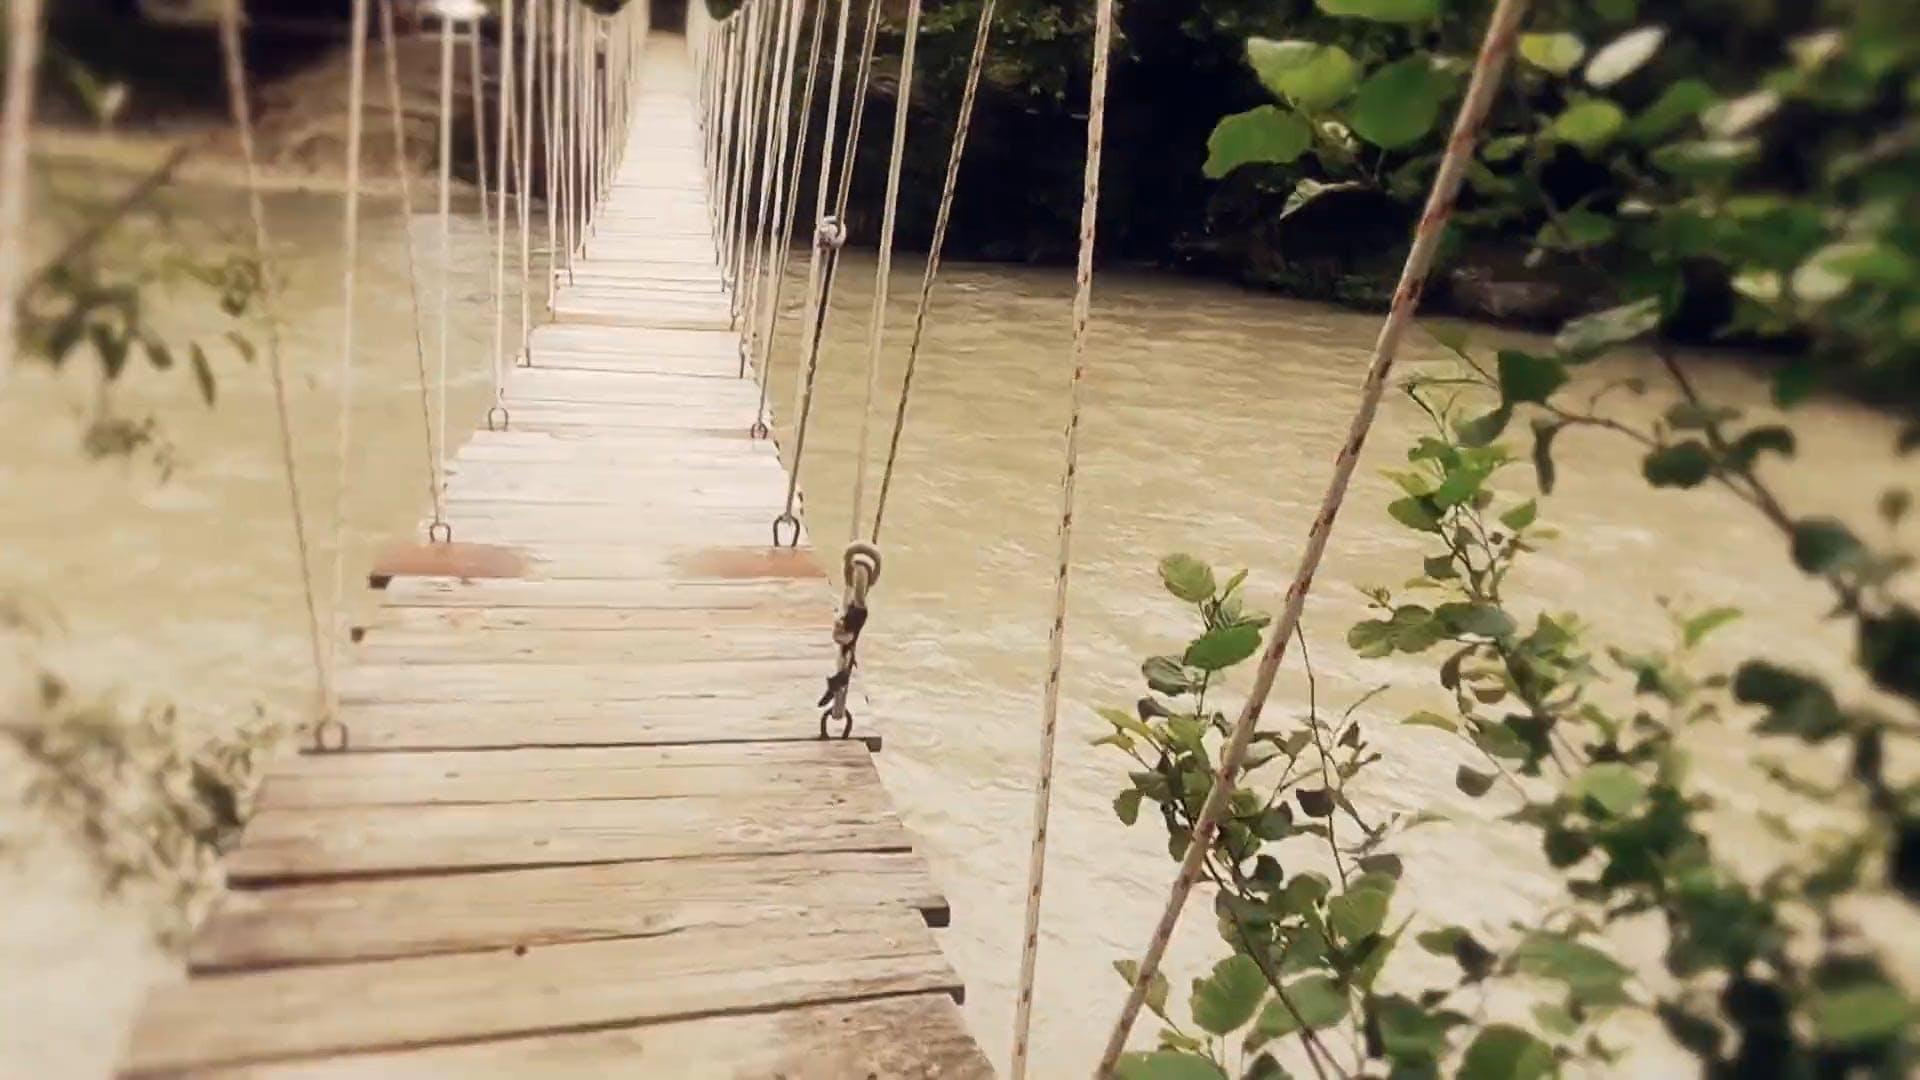 Video Footage Of Crossing A Bridge